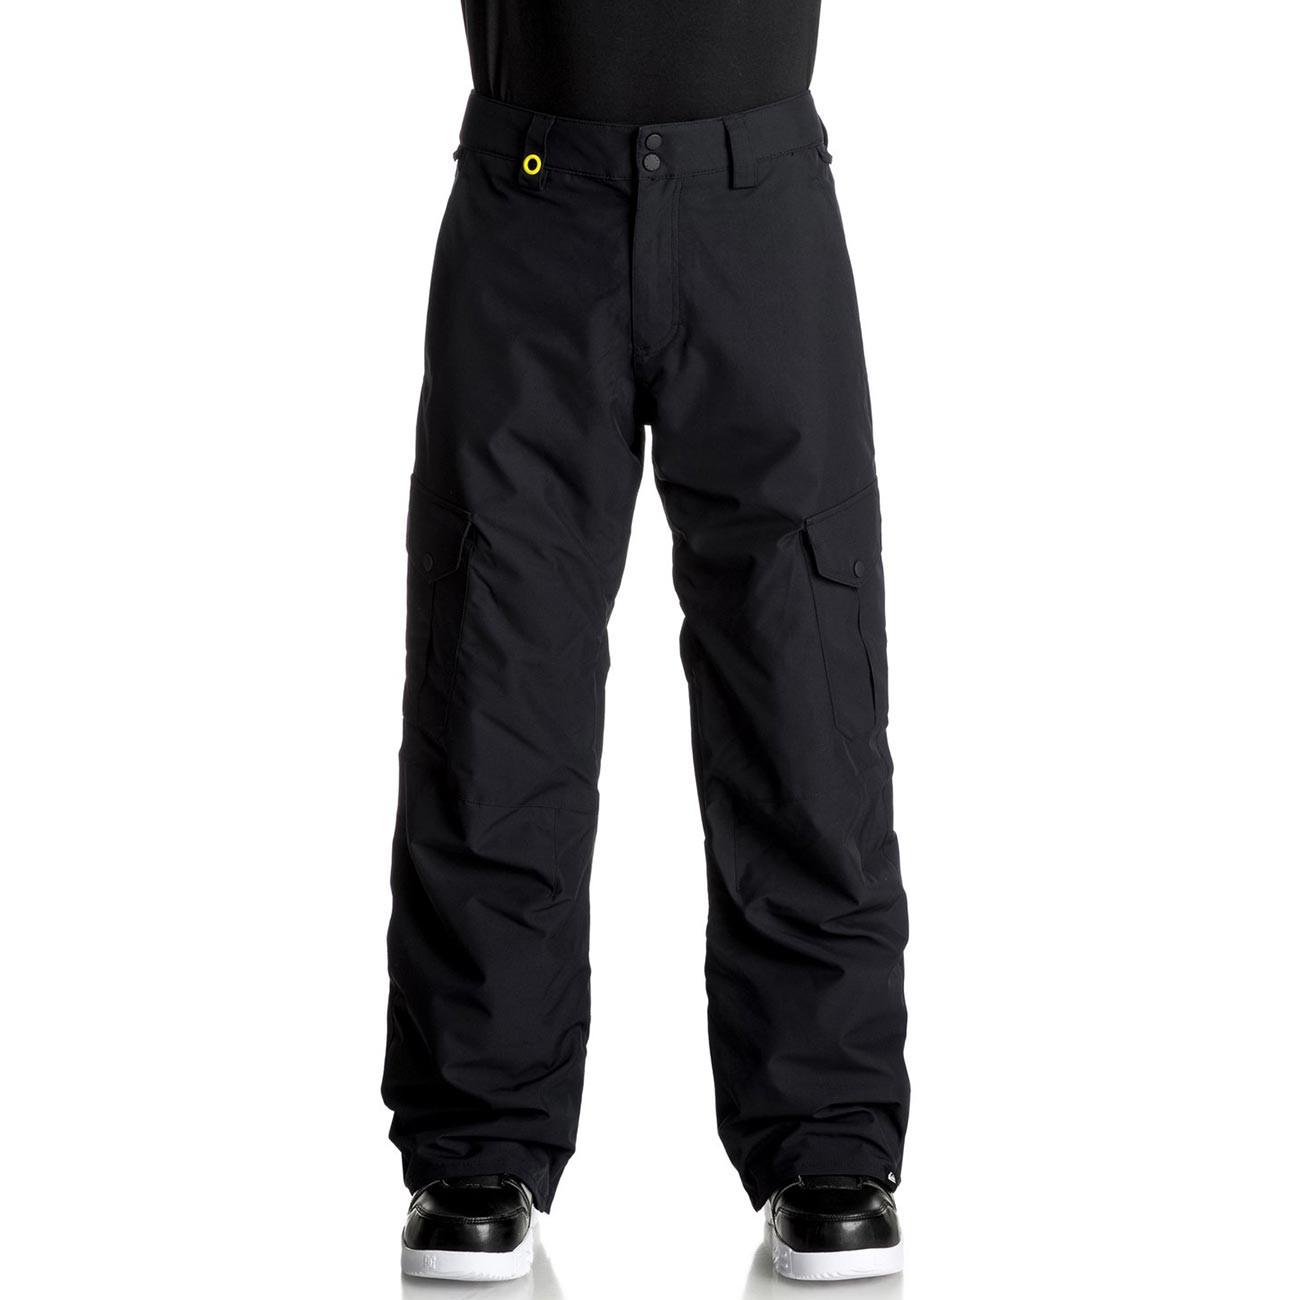 Kalhoty Quiksilver Porter black